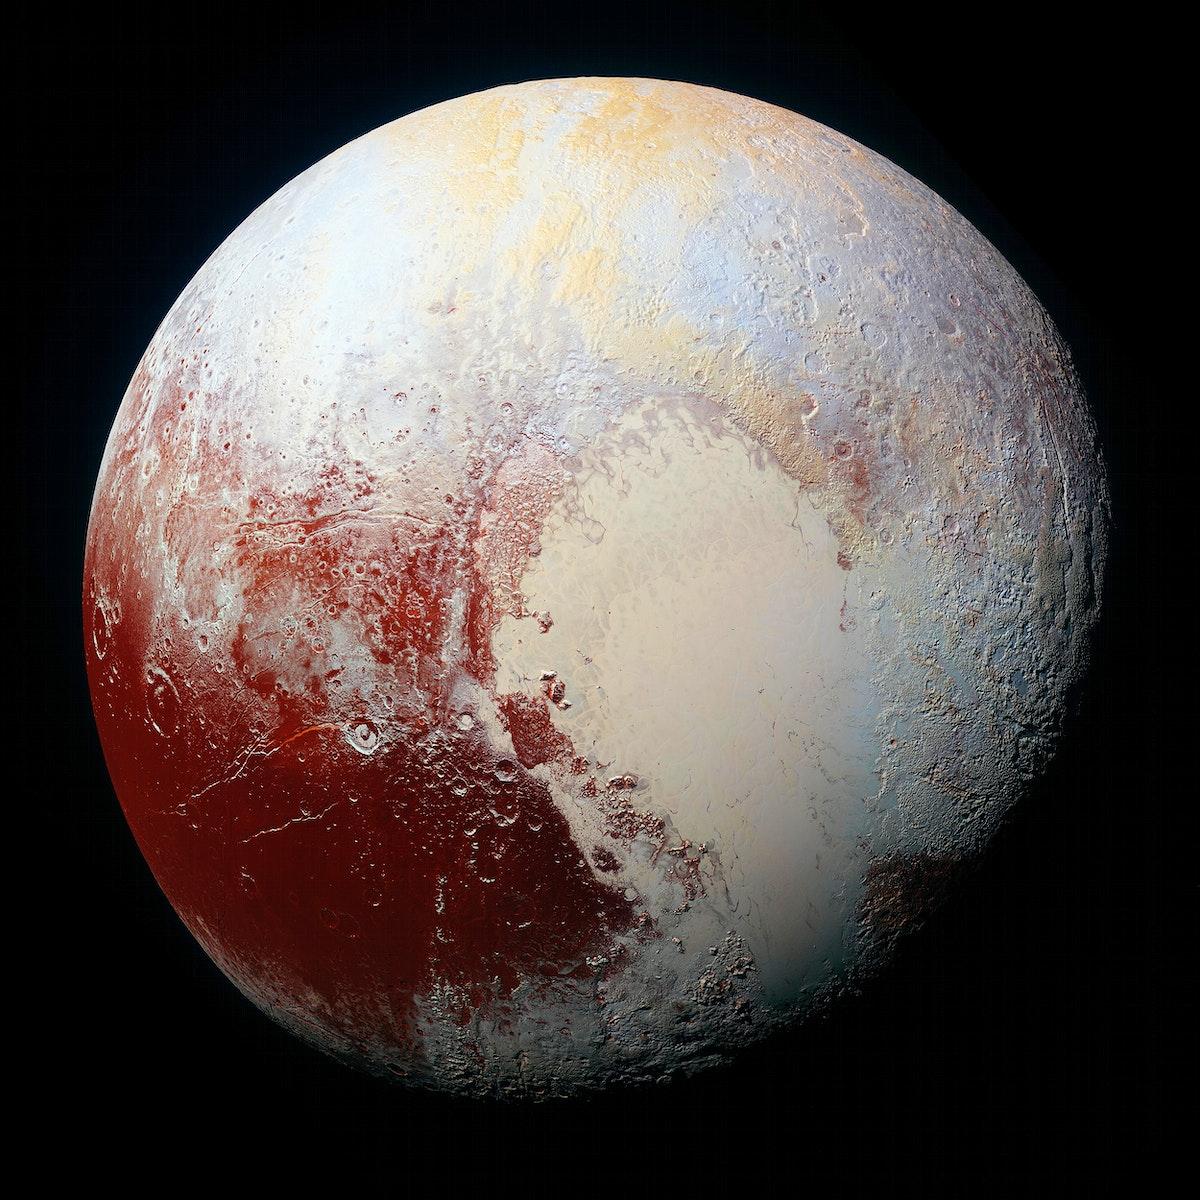 High-resolution enhanced color view of Pluto. Original from NASA. Digitally enhanced by rawpixel.